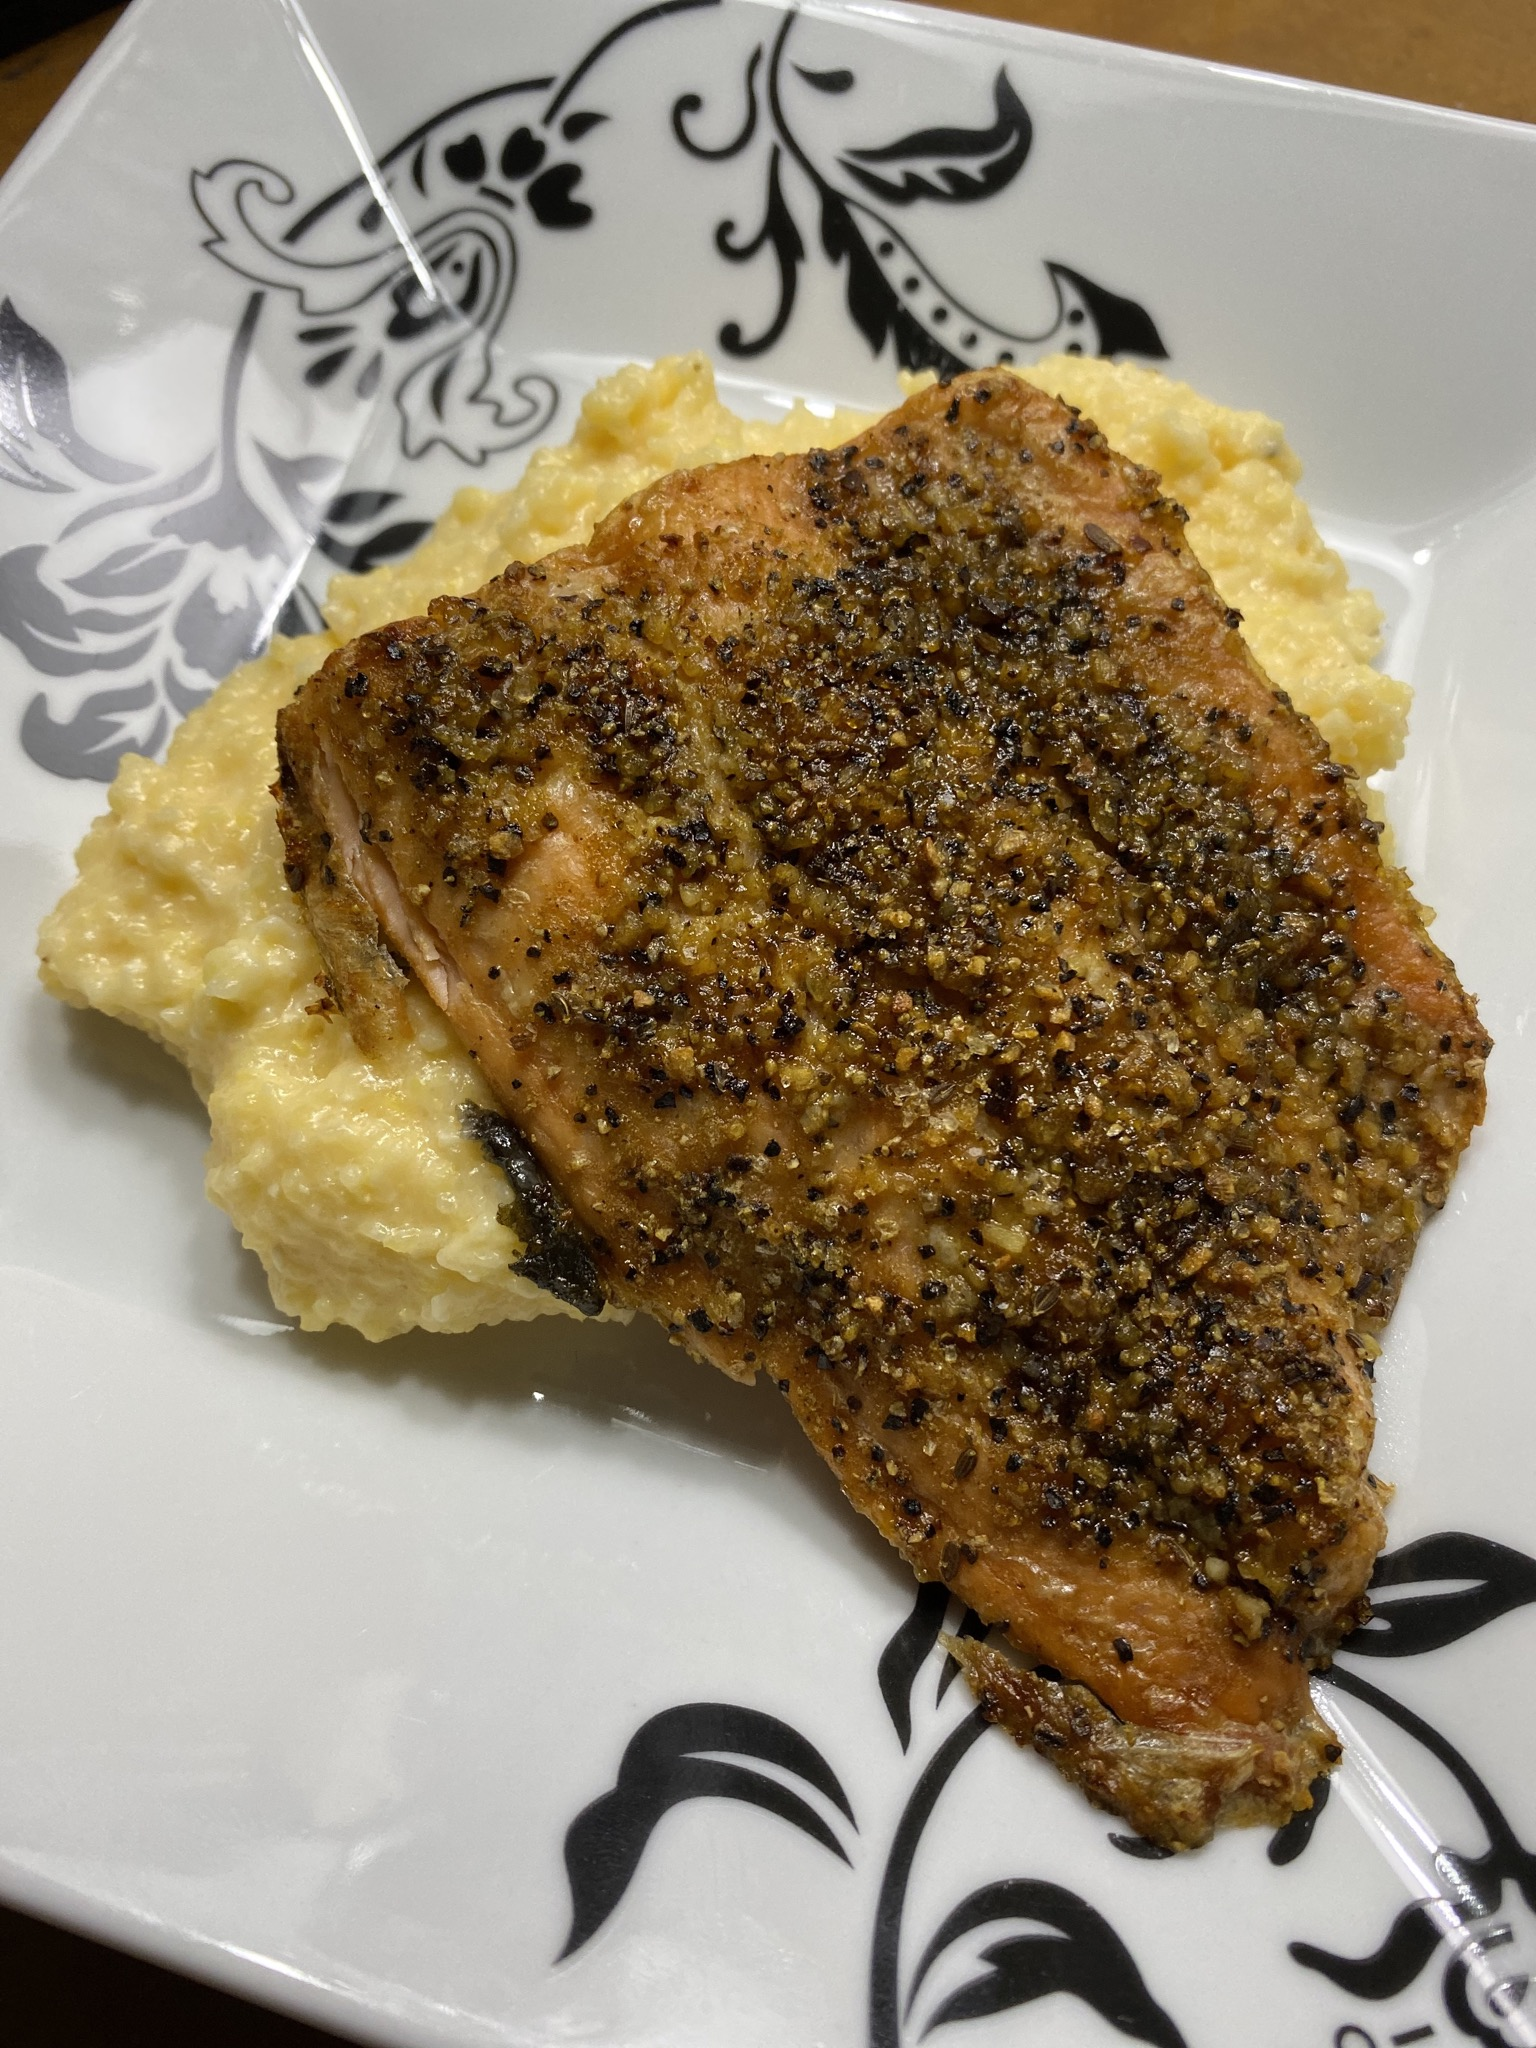 Spicy Air Fryer Salmon